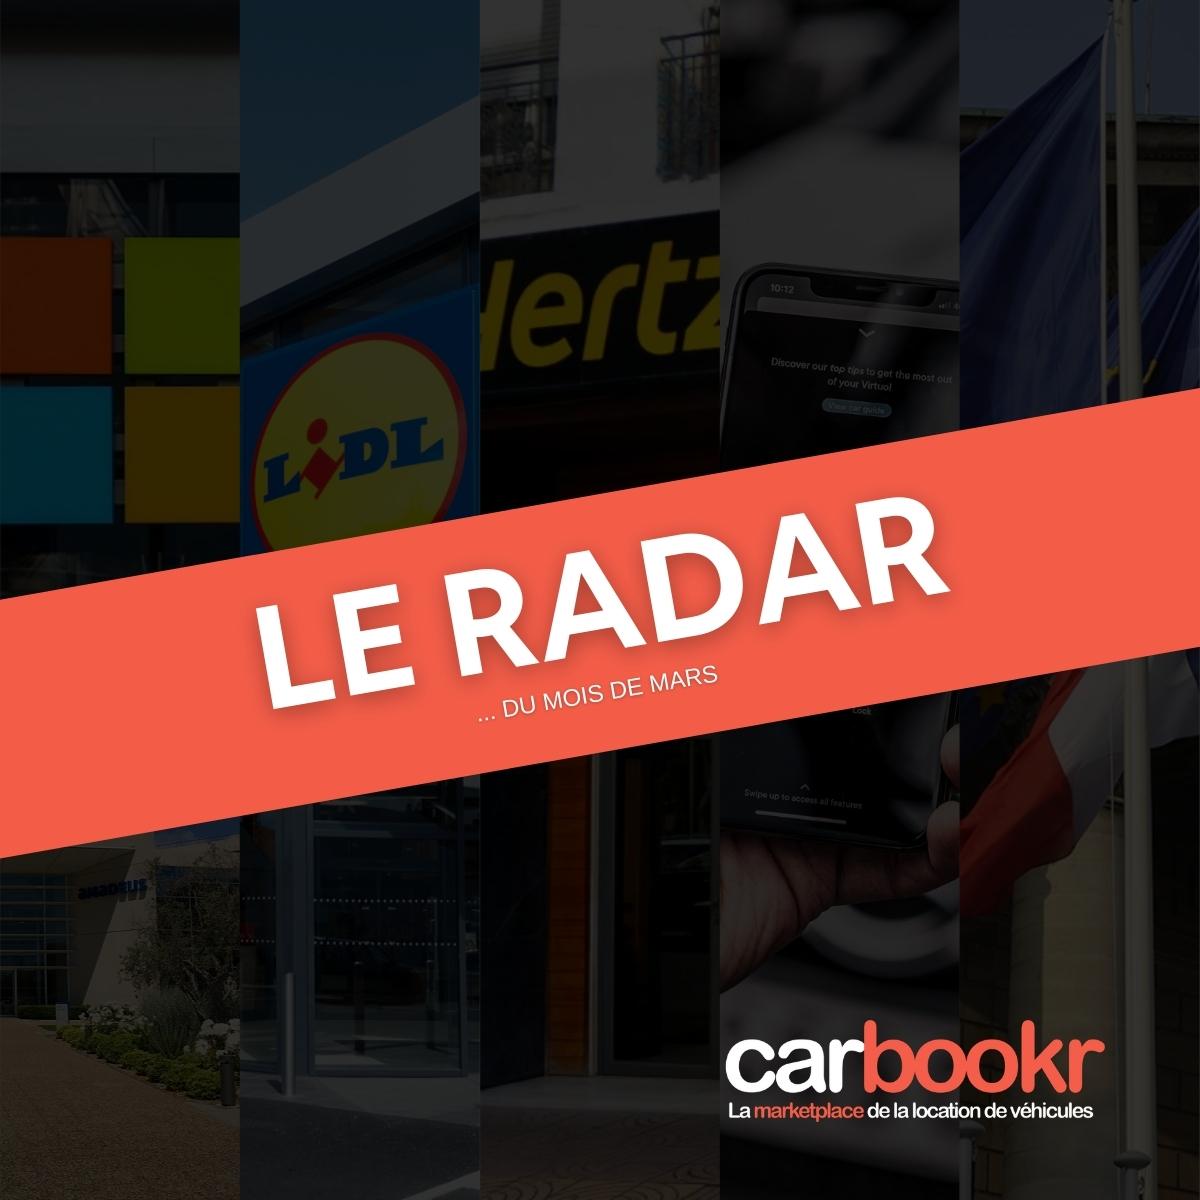 Le radar Carbookr